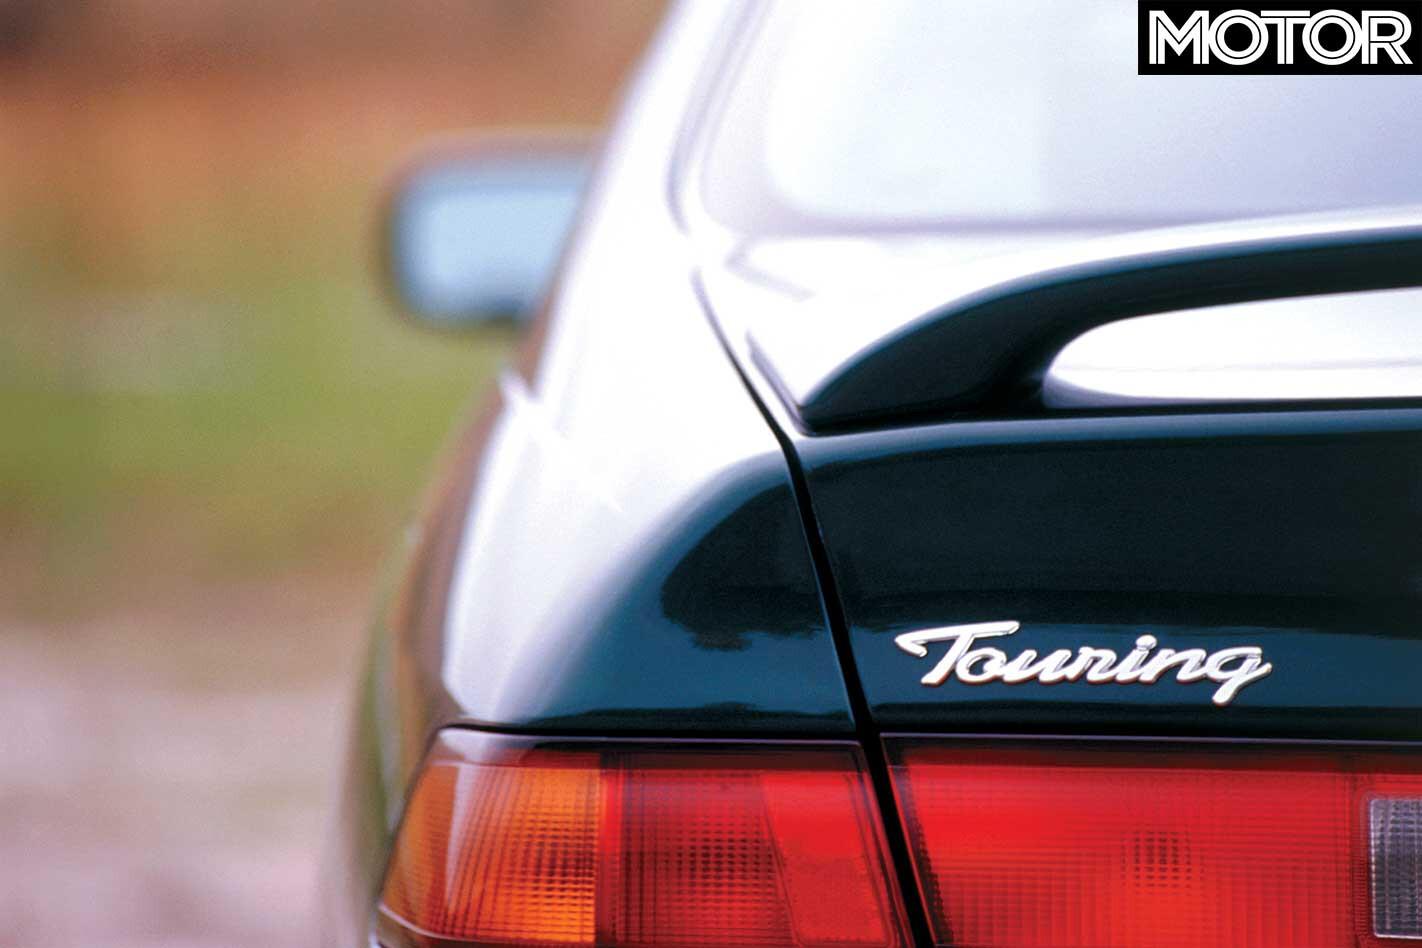 1999 Toyota Camry V 6 Touring Spec Jpg